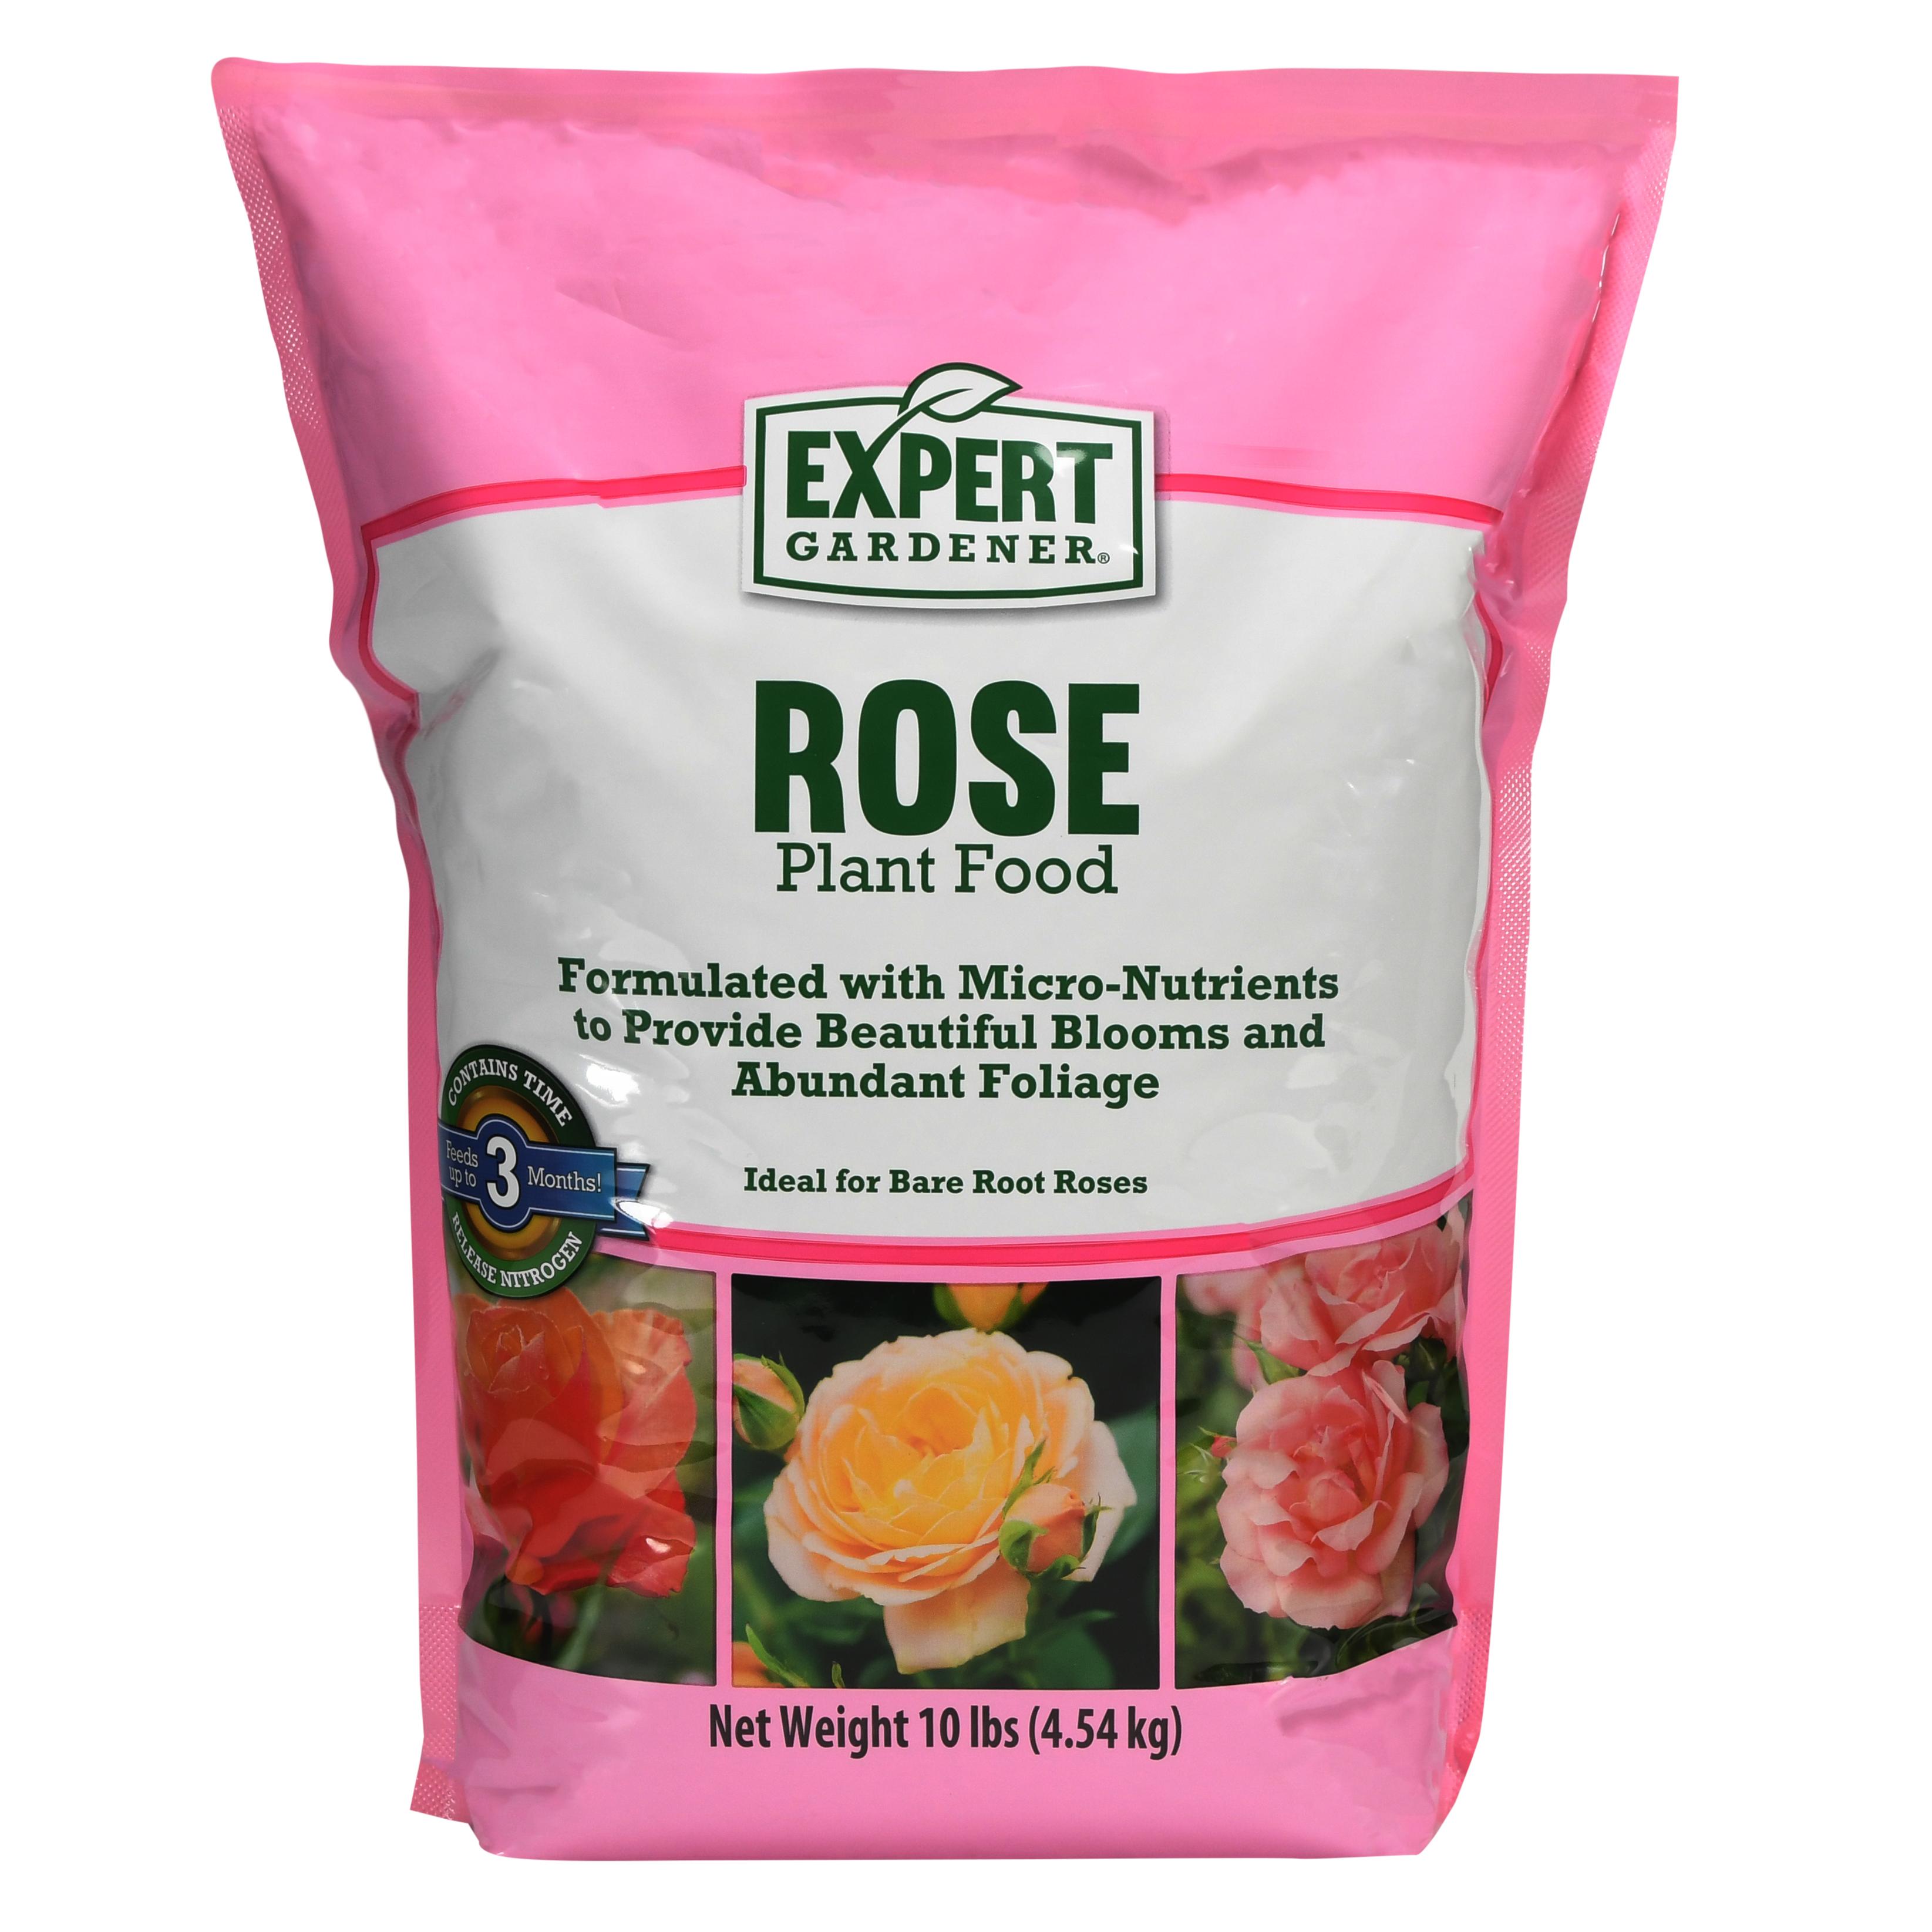 Expert Gardener Rose Plant Food 12-6-10, 10 lbs